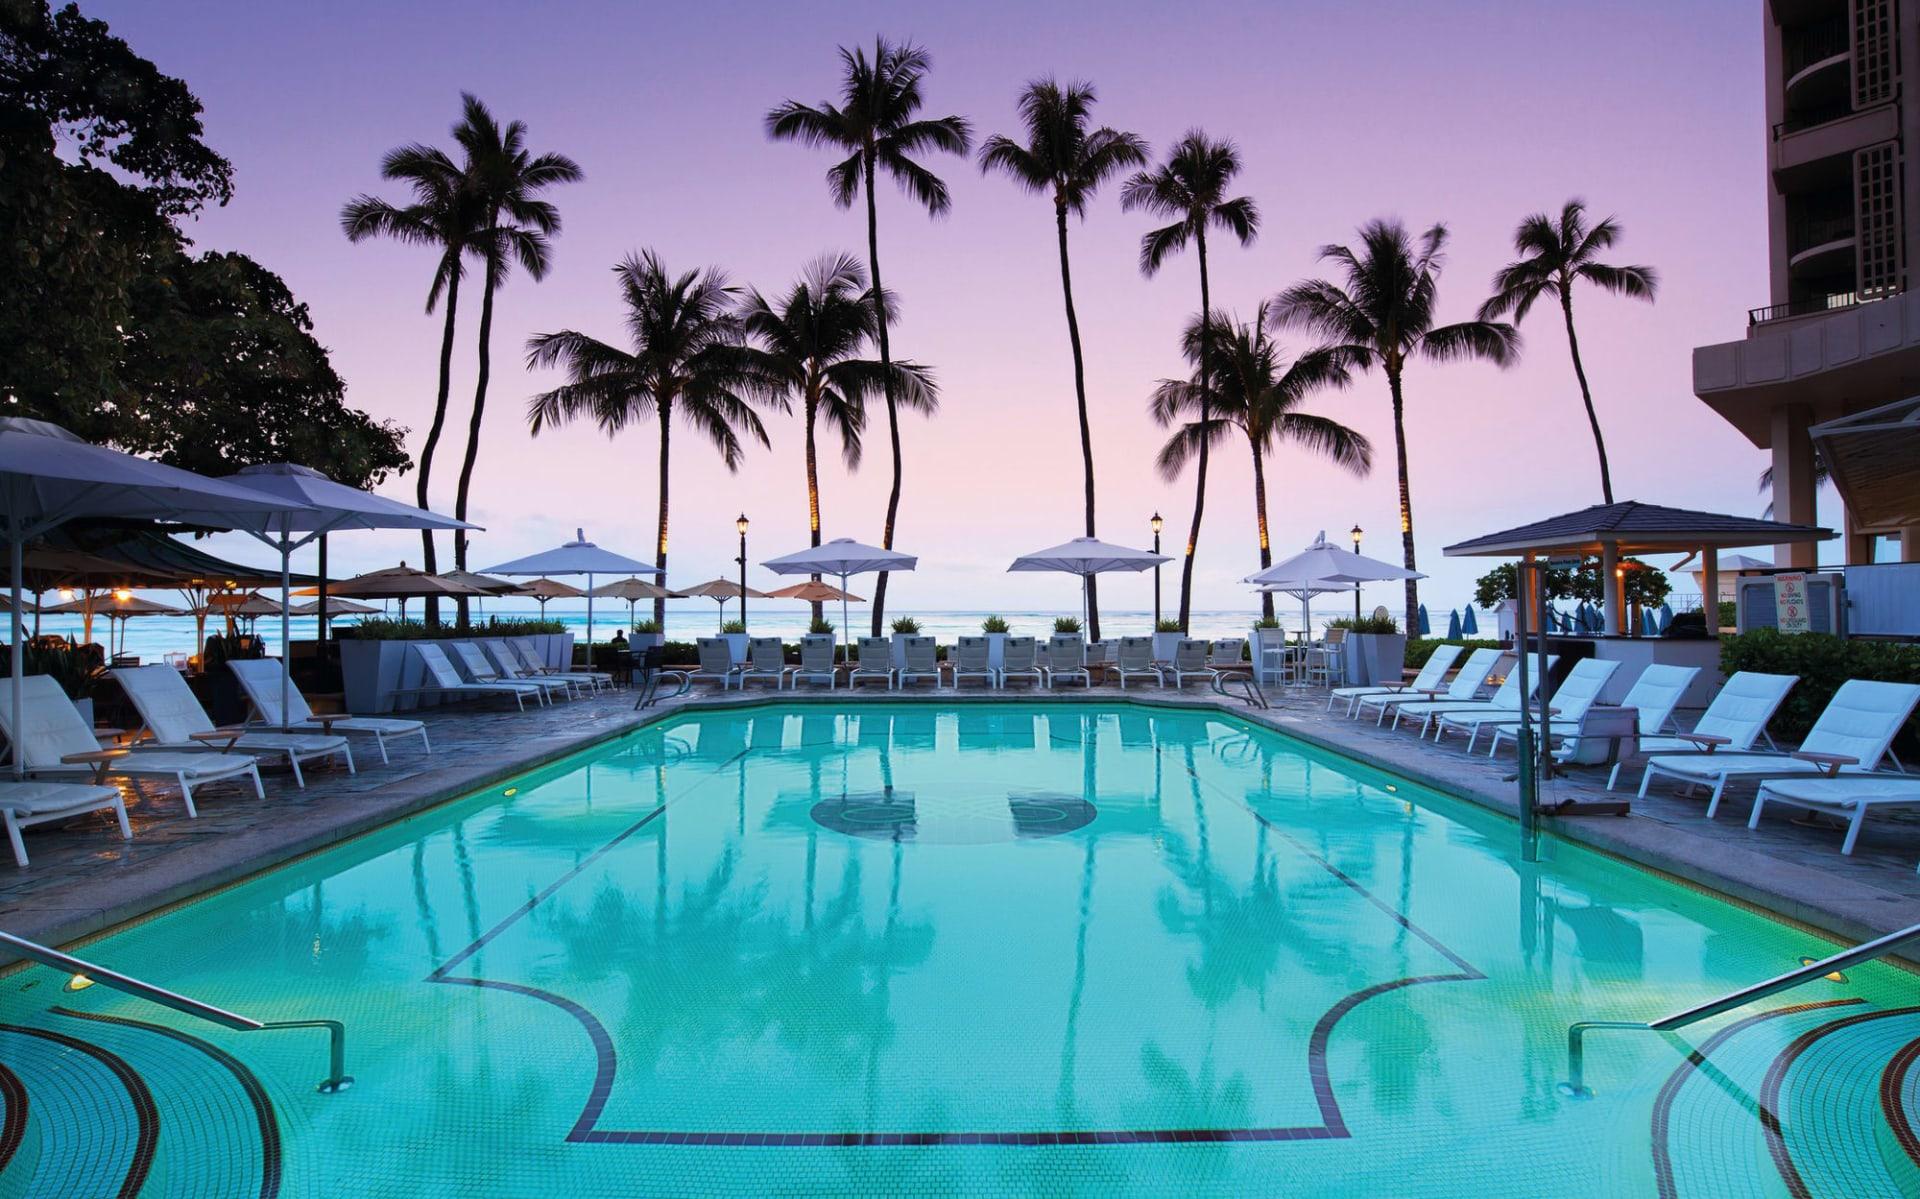 Moana Surfrider, a Westin Resort in Honolulu - Oahu: Moana Surfrider, a Westin Resort - Poolanlage